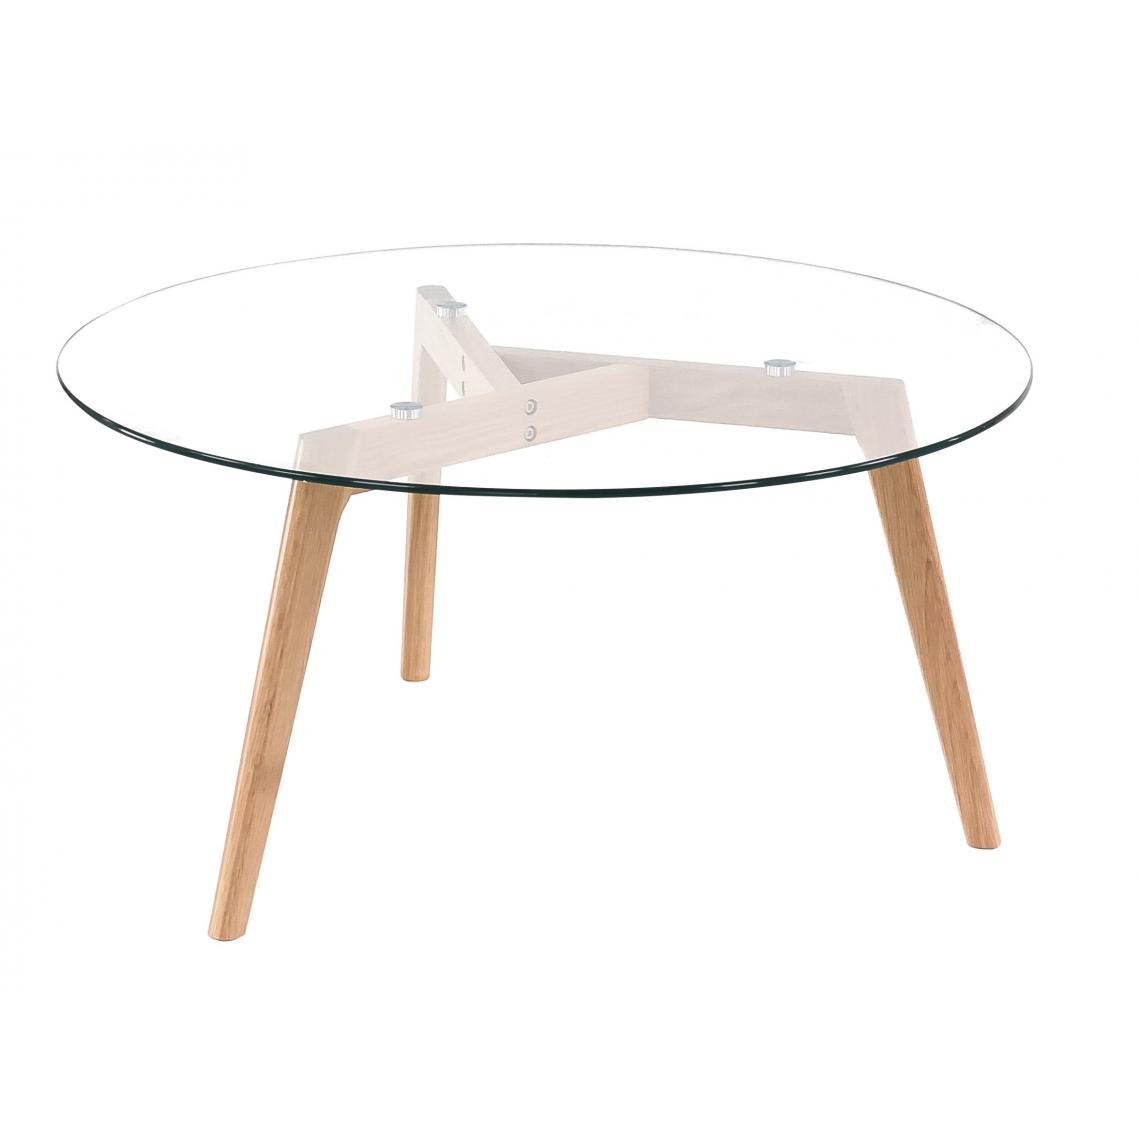 Basse Verre Table Fiord D90cm Scandinave vNwnm08